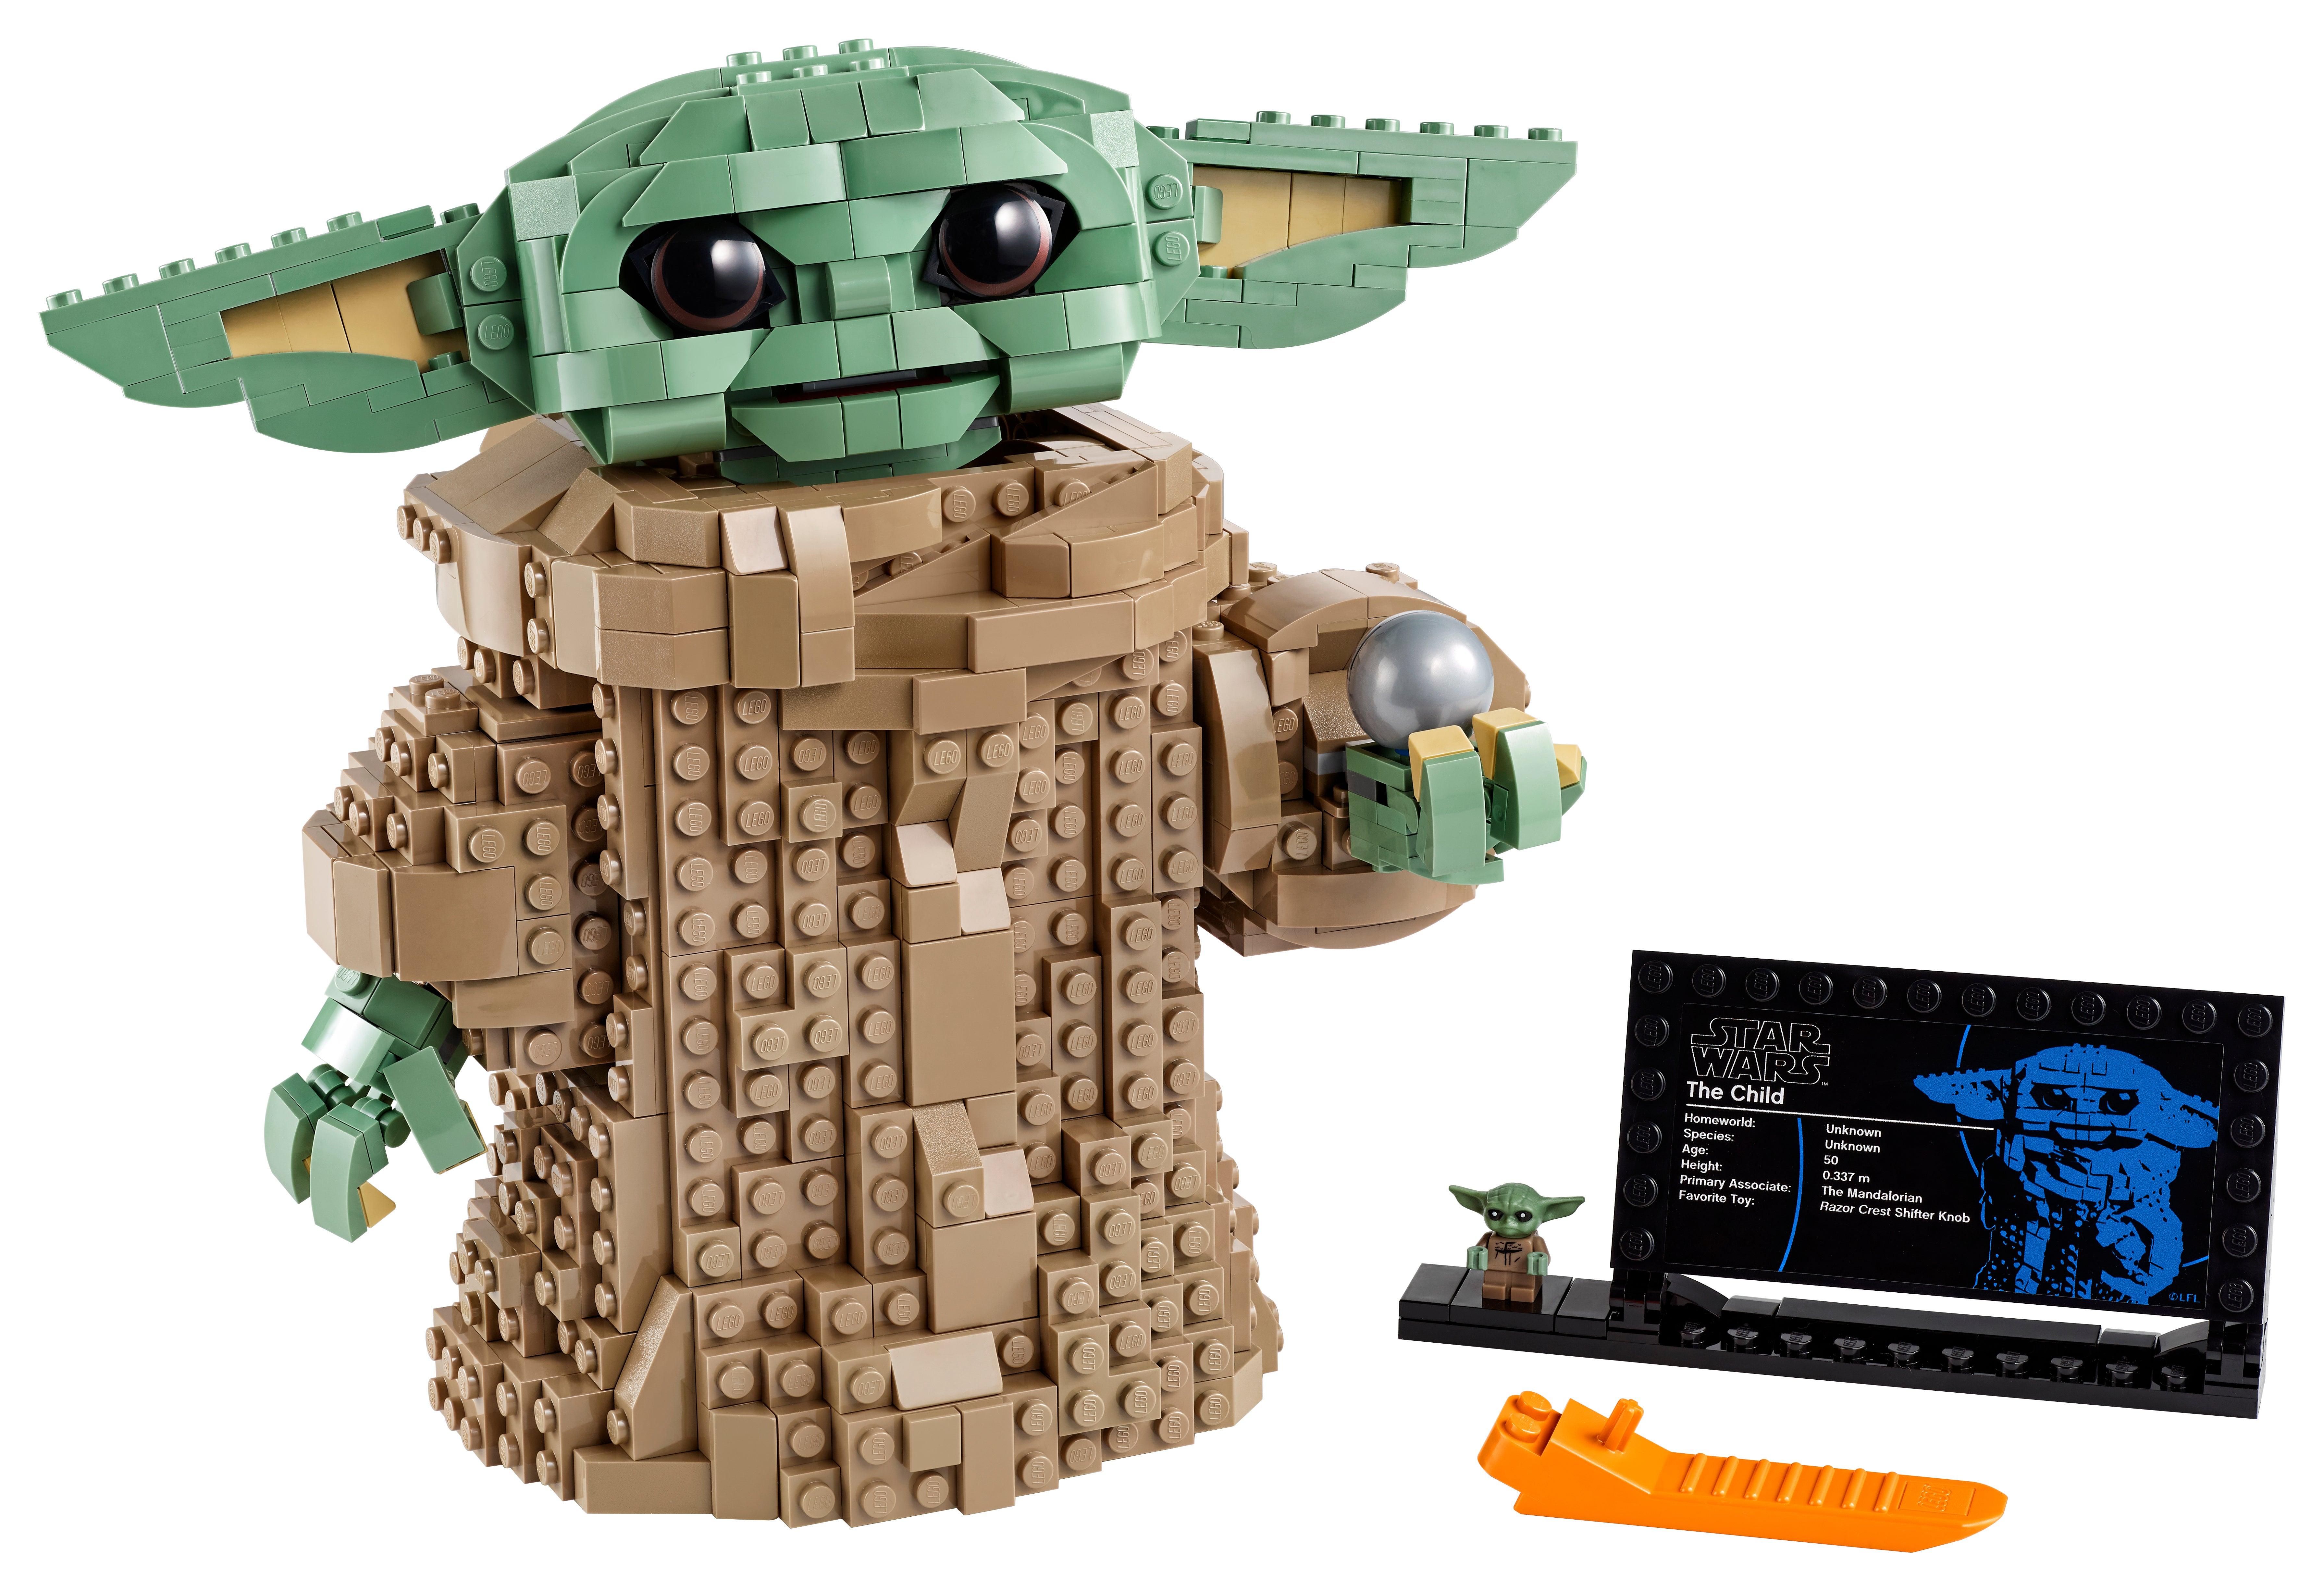 M MEDIUM SHIRT NEW LEGO STARS WARS YODA GLOW IN DARK YOUTH SIZE AGES 8-9